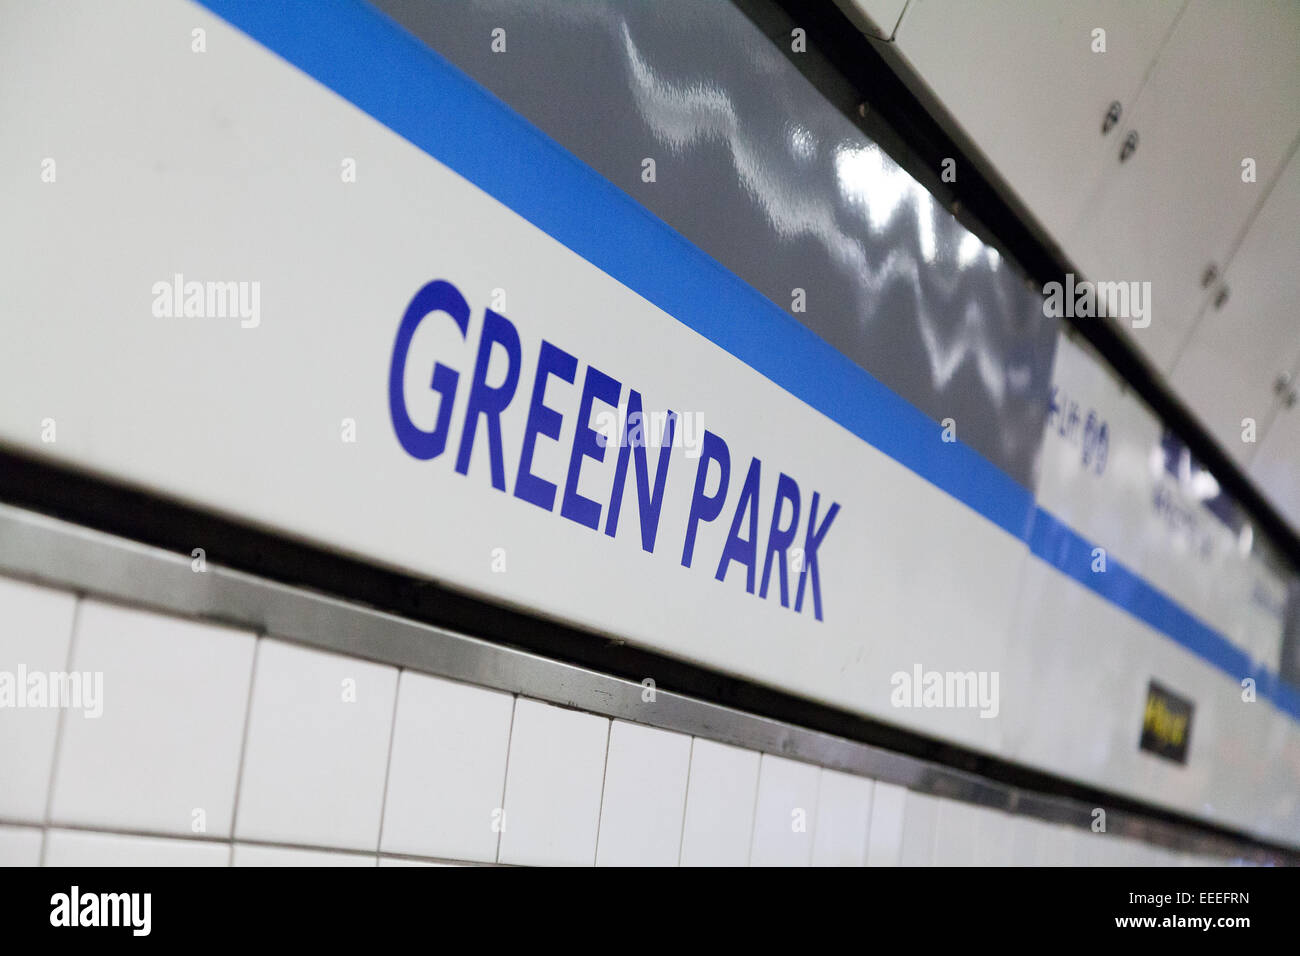 Station signage at Green Park - Stock Image